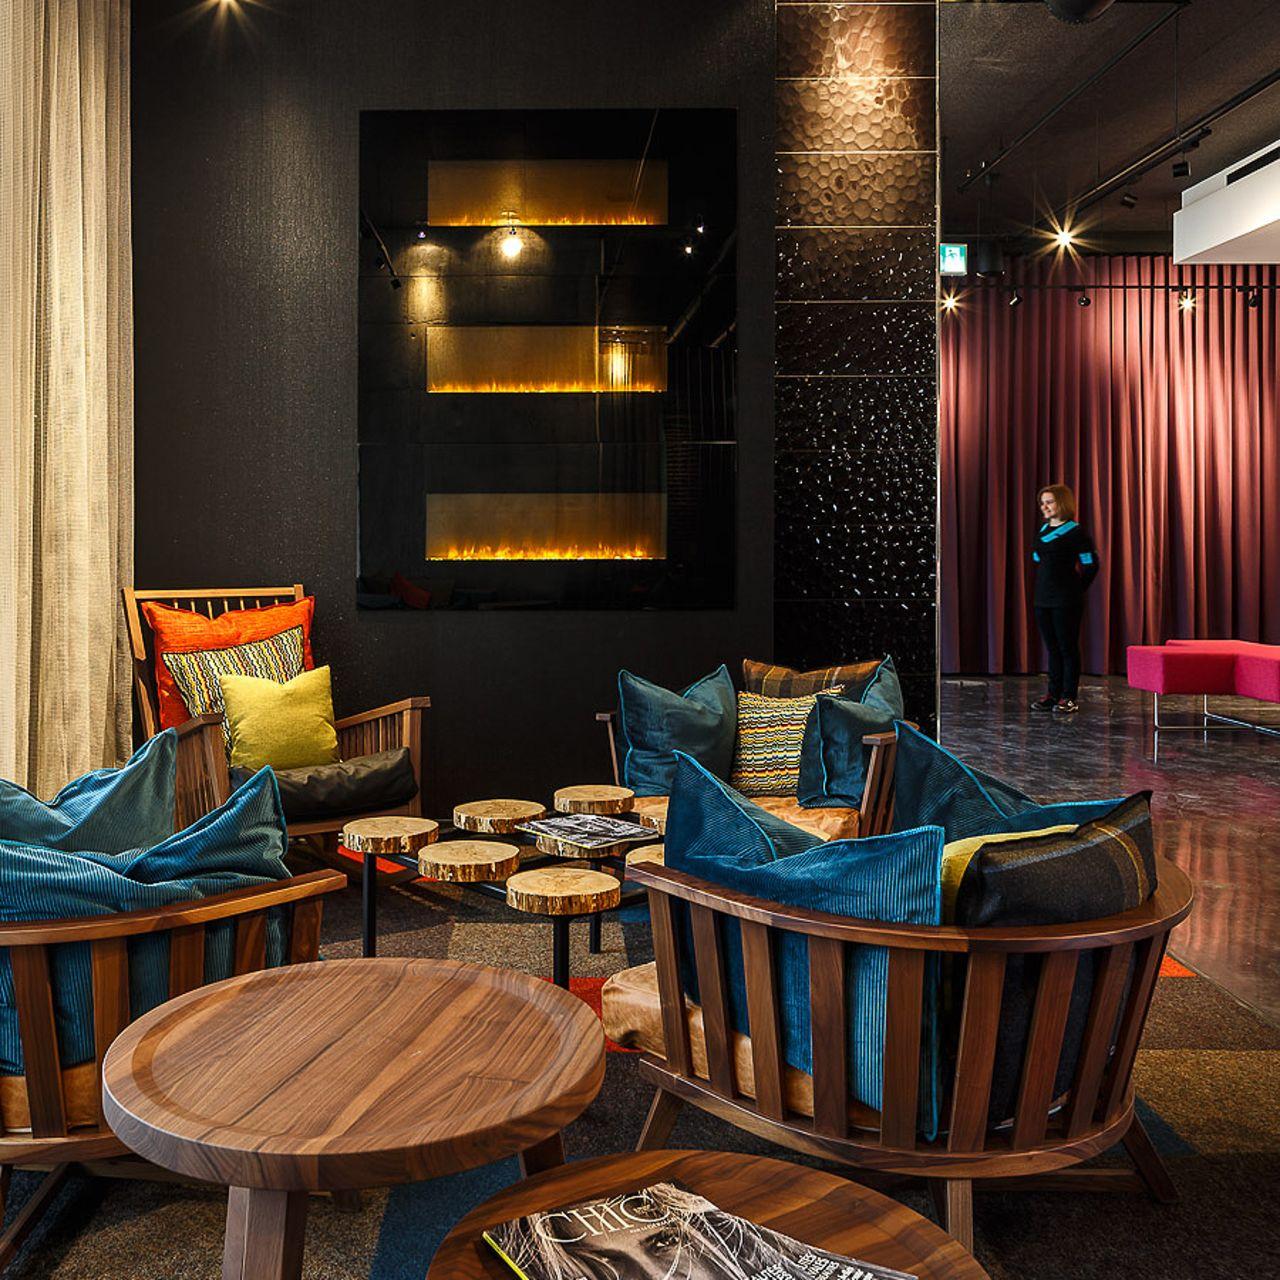 Hotel ontario alt hotel ottawa canusa for Hotel boutique ottawa